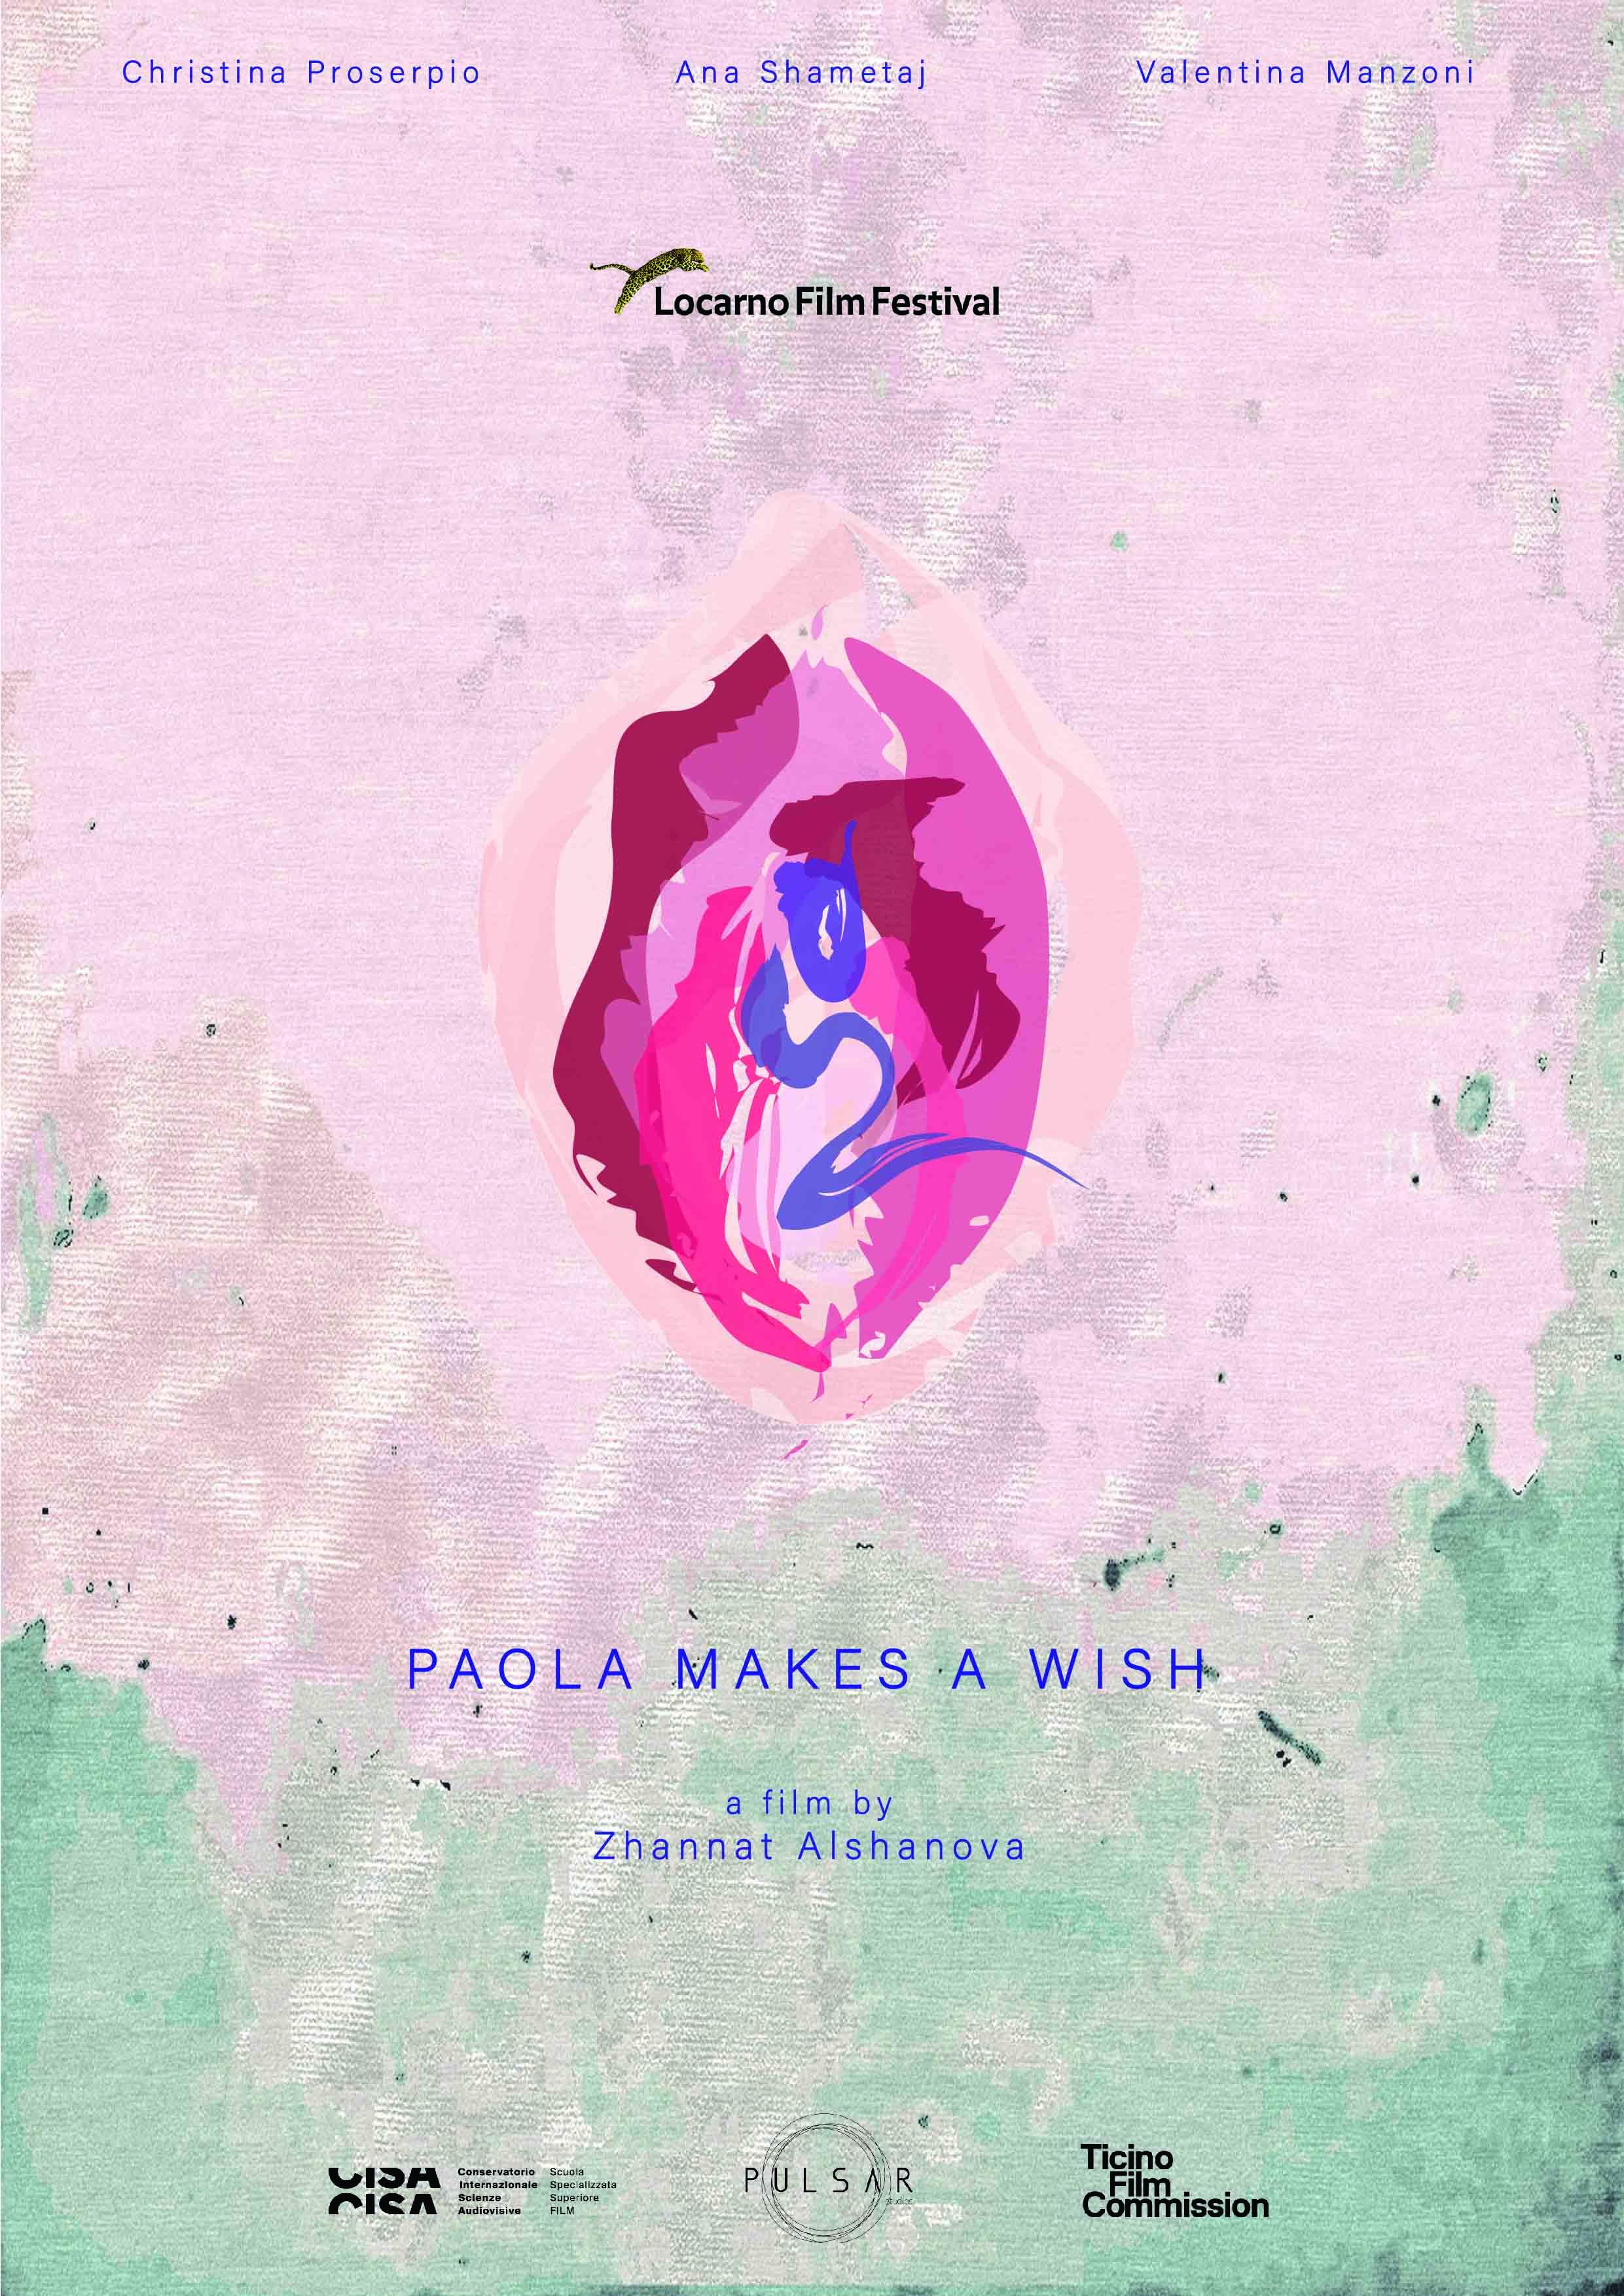 Paola Makes A Wish